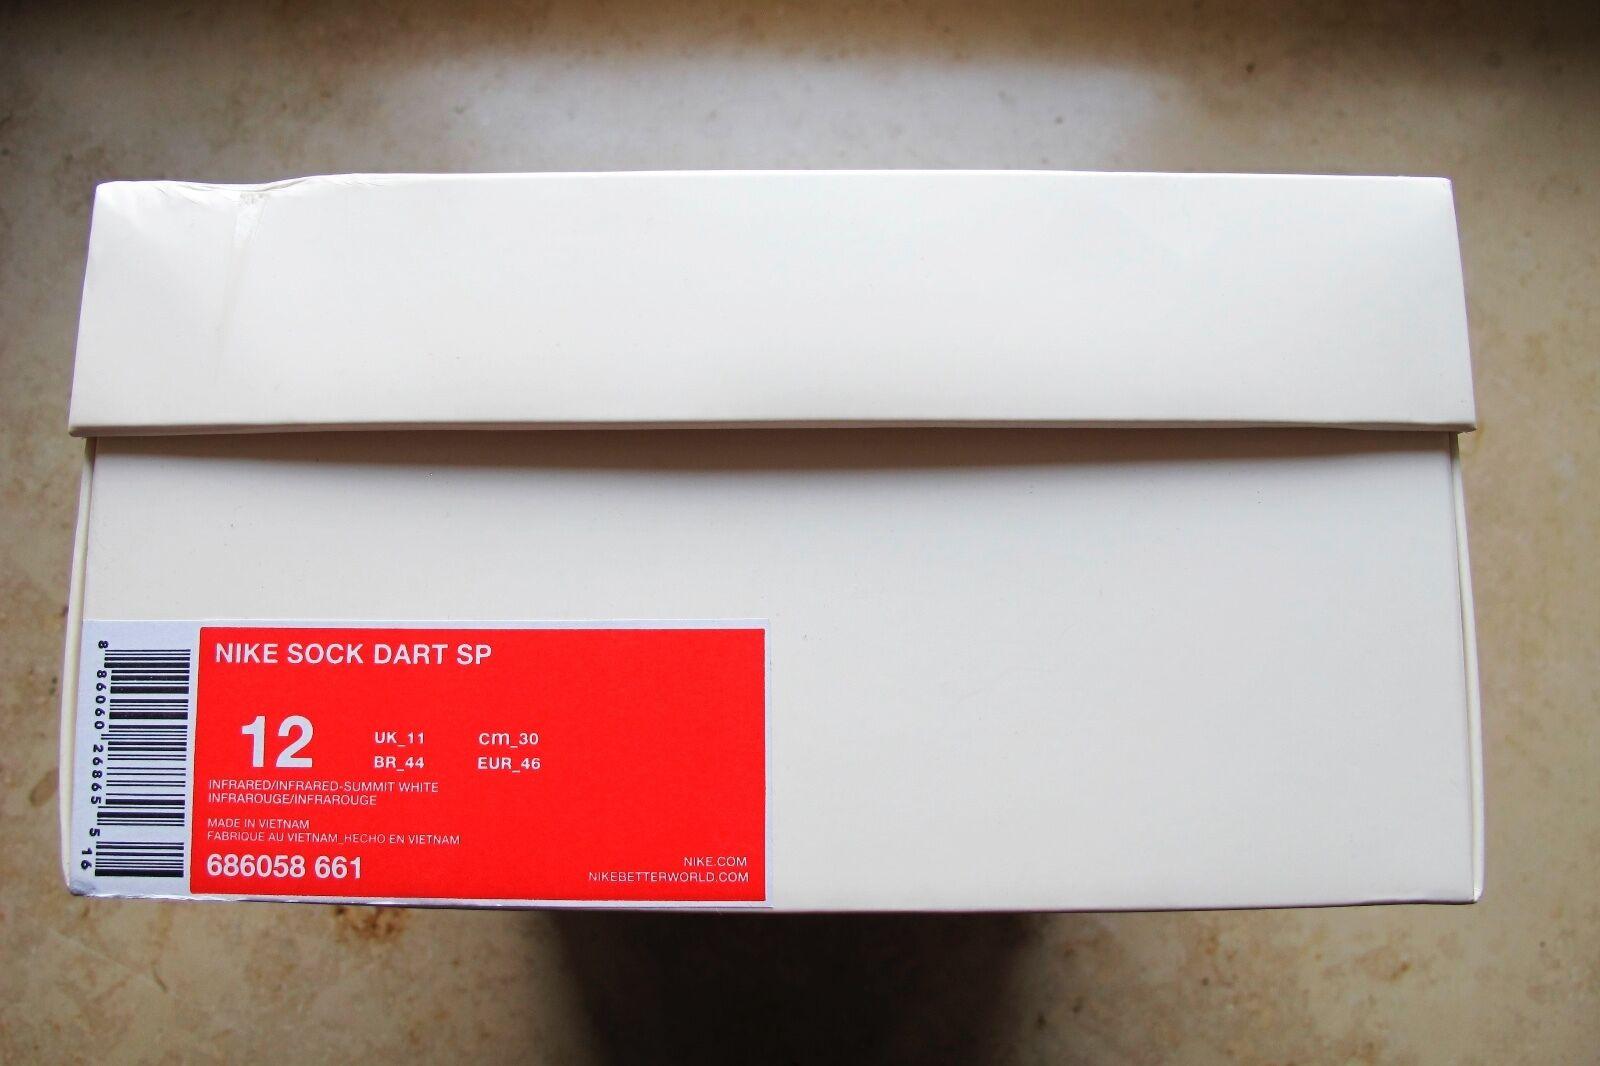 Nike Sock Dart SP INFRARED SUMMIT WHITE SIZE 12 (686058-661)